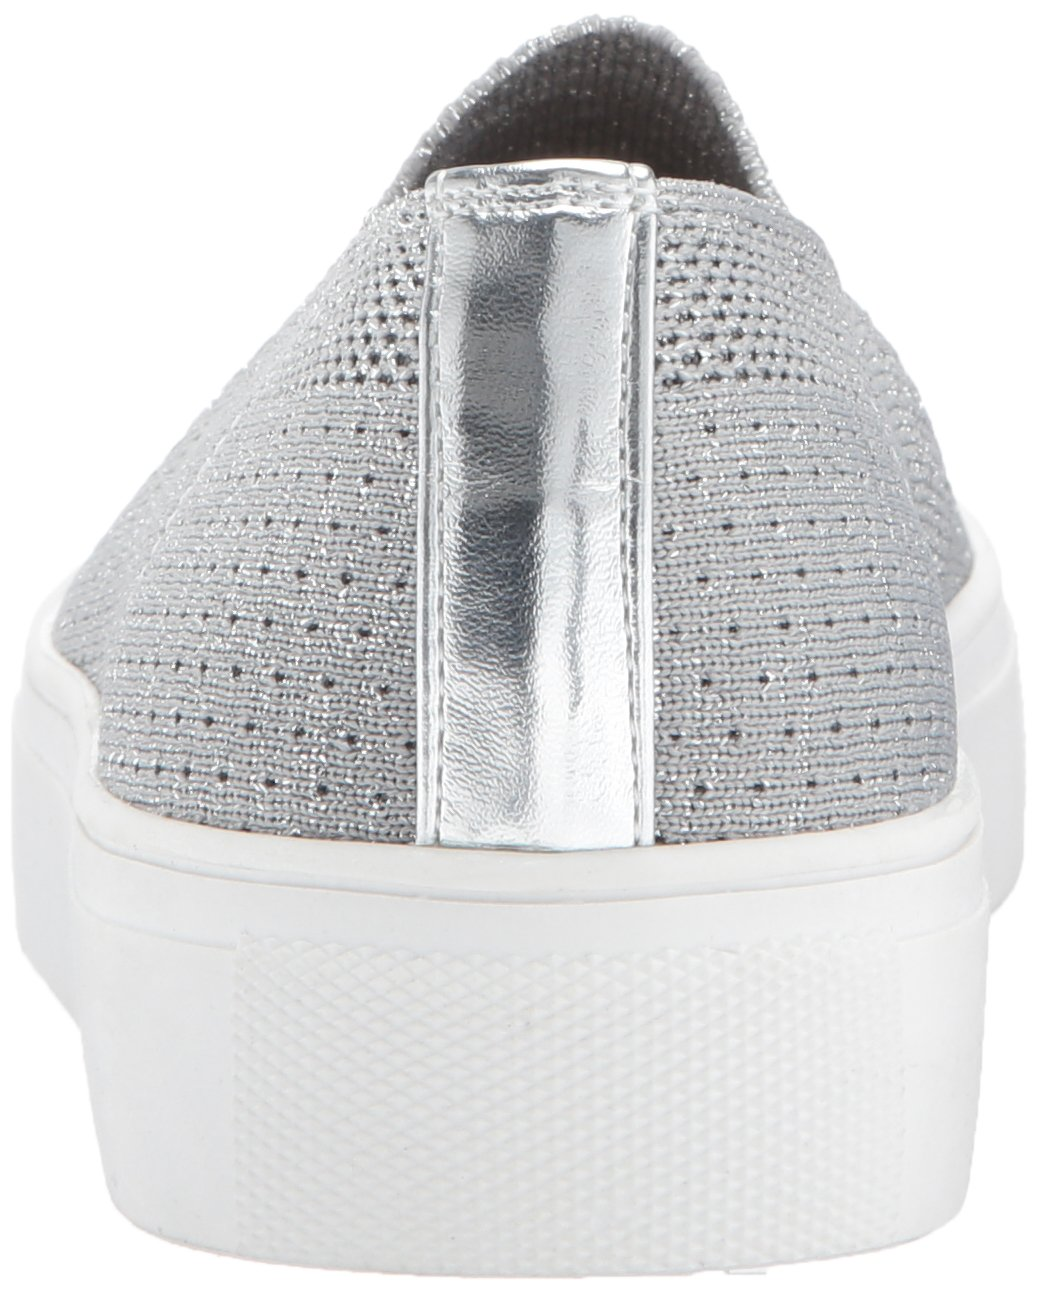 STEVEN NC-Kai by Steve Madden Women's NC-Kai STEVEN Sneaker B071Z244ZD 8.5 B(M) US|Silver a761ab